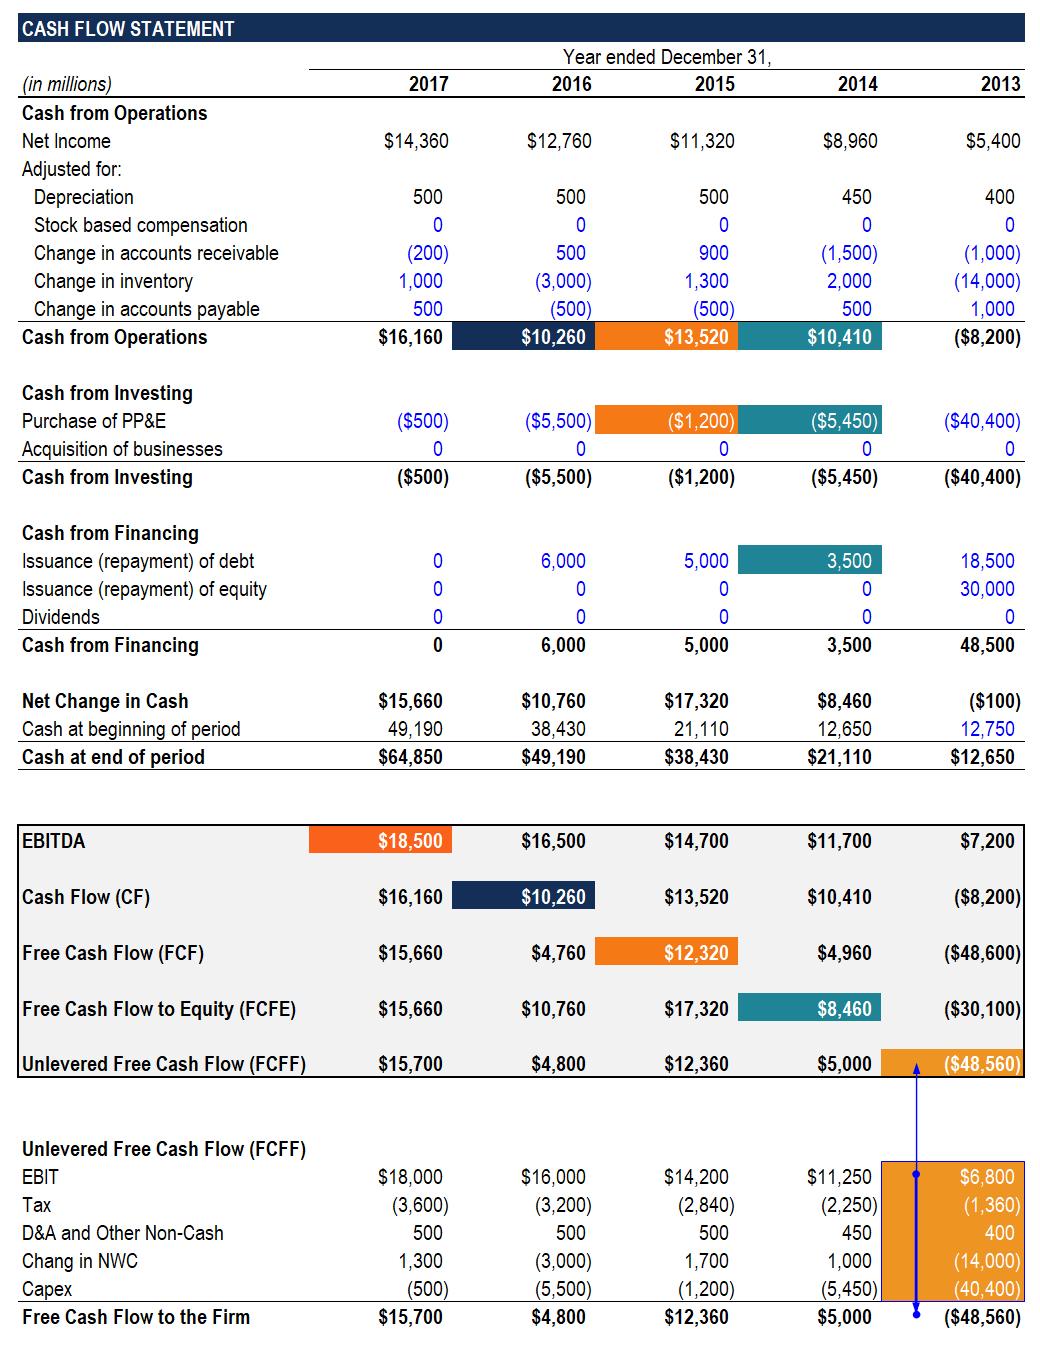 Ebitda Valuation Spreadsheet Intended For The Ultimate Cash Flow Guide  Understand Ebitda, Cf, Fcf, Fcff